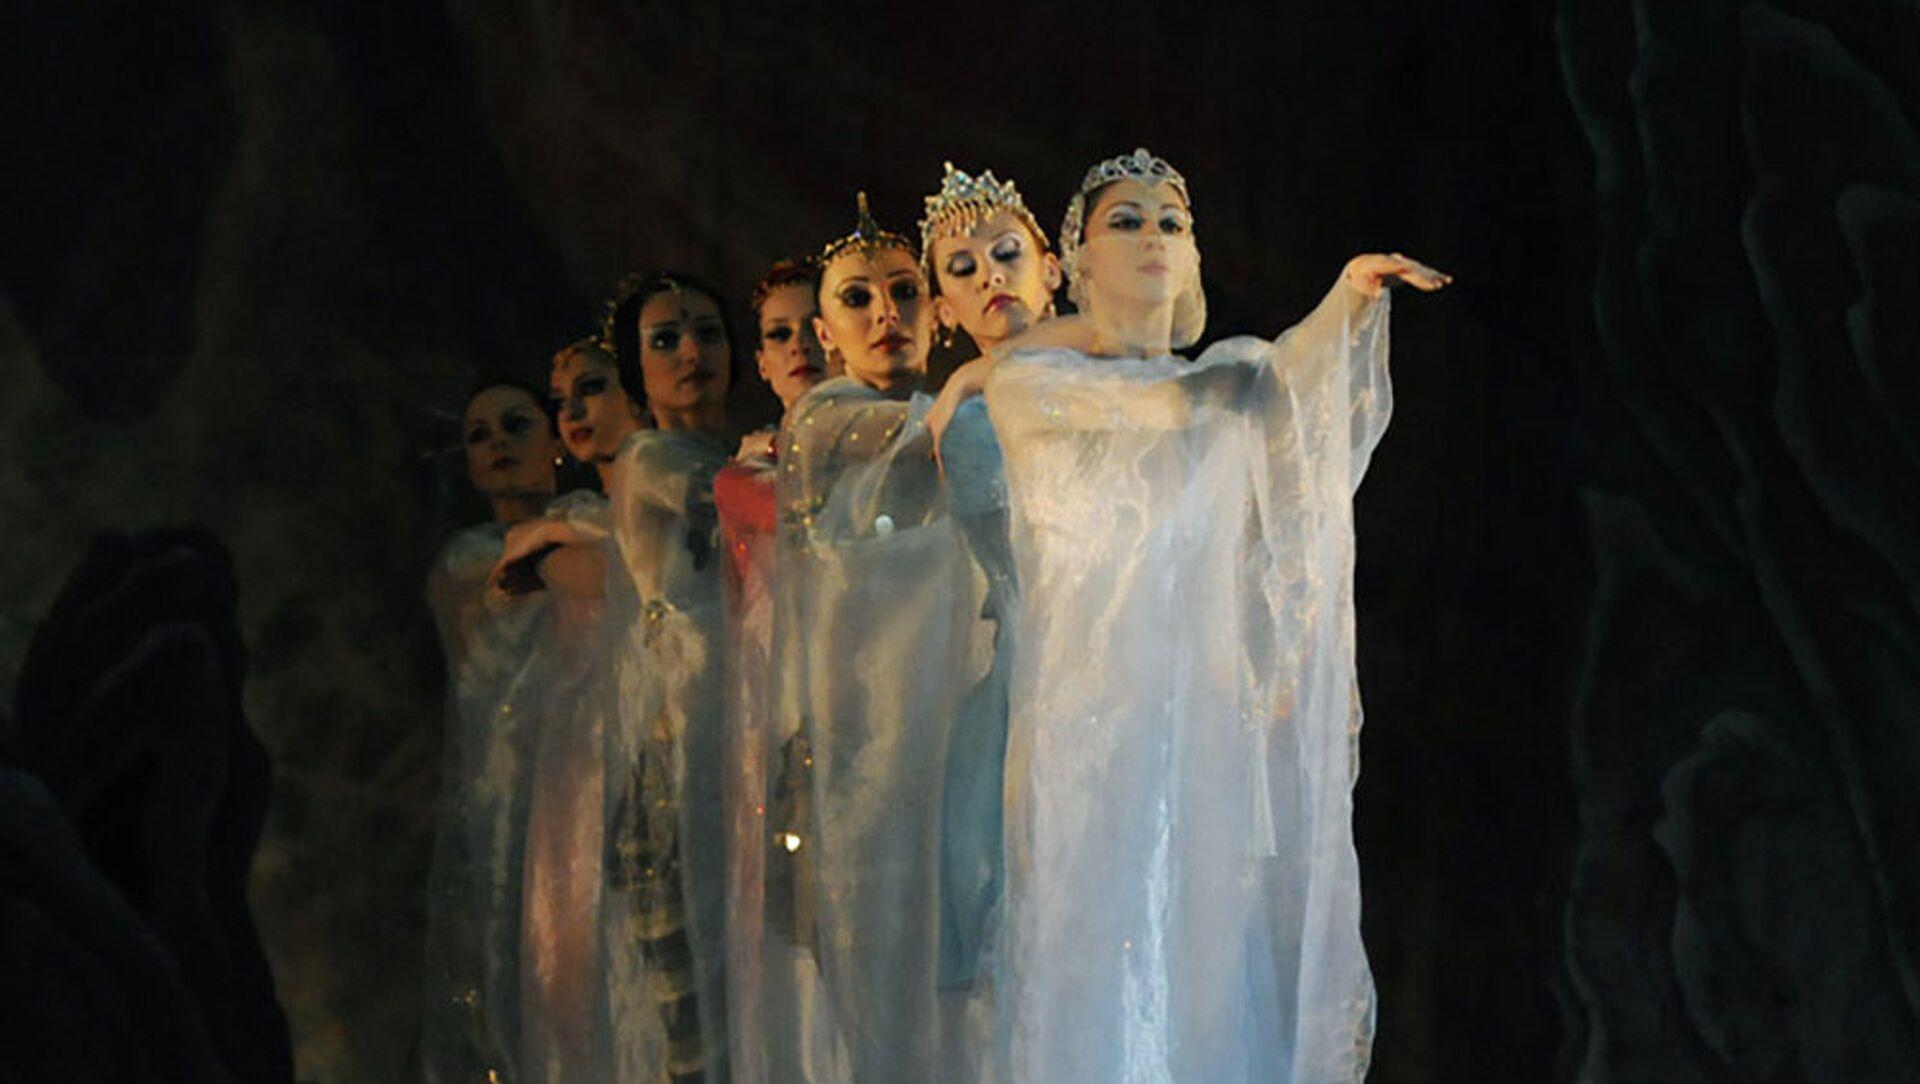 Балет известного азербайджанского композитора Гара Гараева Семь красавиц, фото из архива - Sputnik Азербайджан, 1920, 05.04.2021